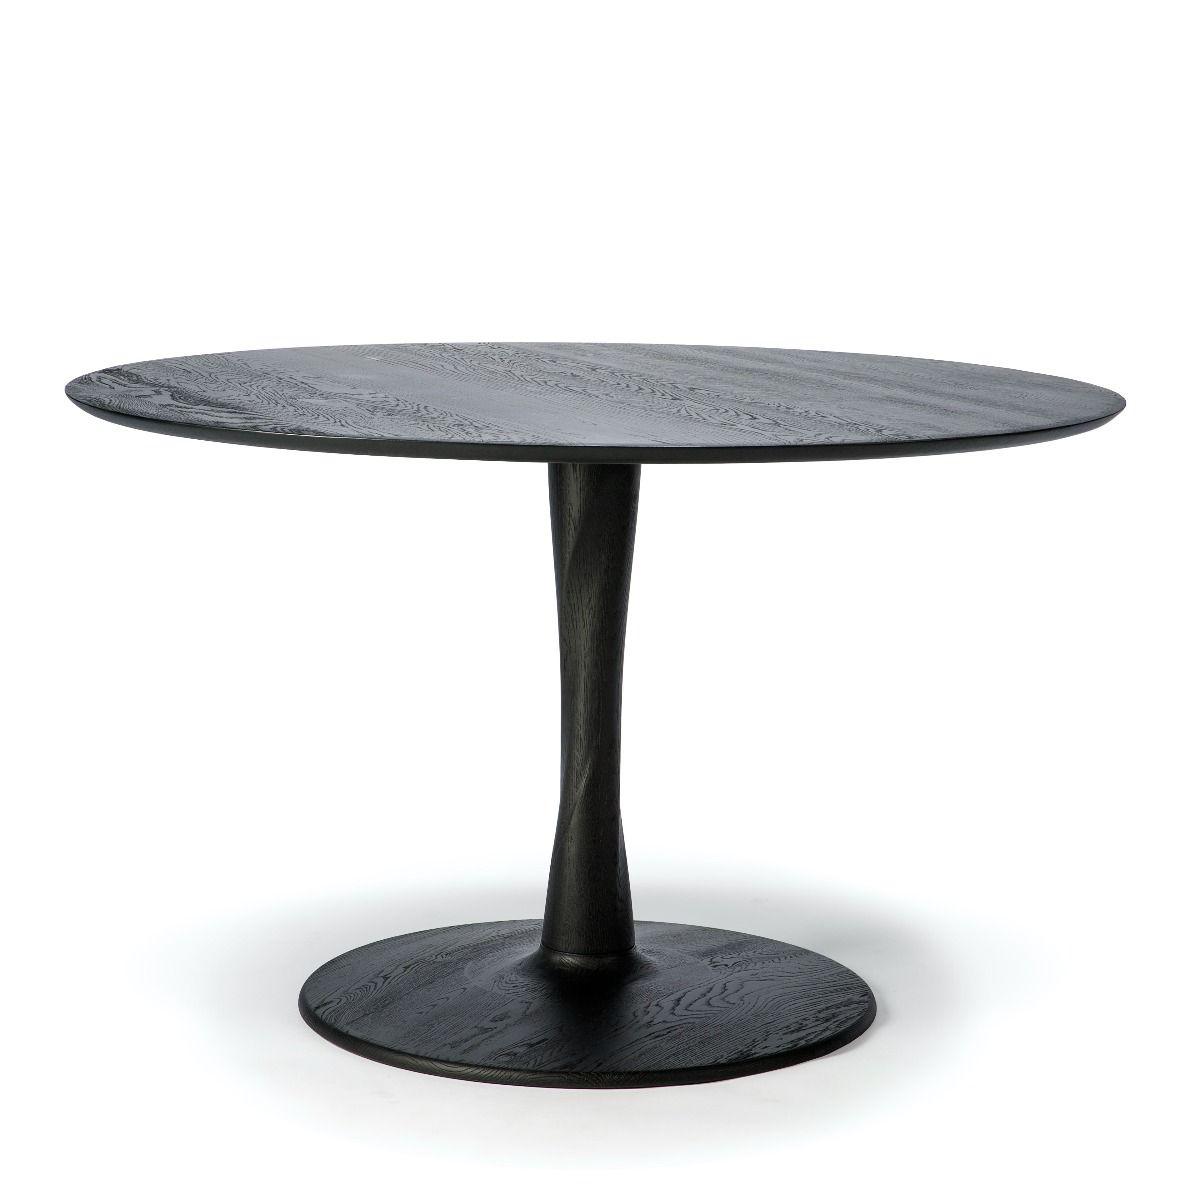 Ethnicraft Torsion Table in black